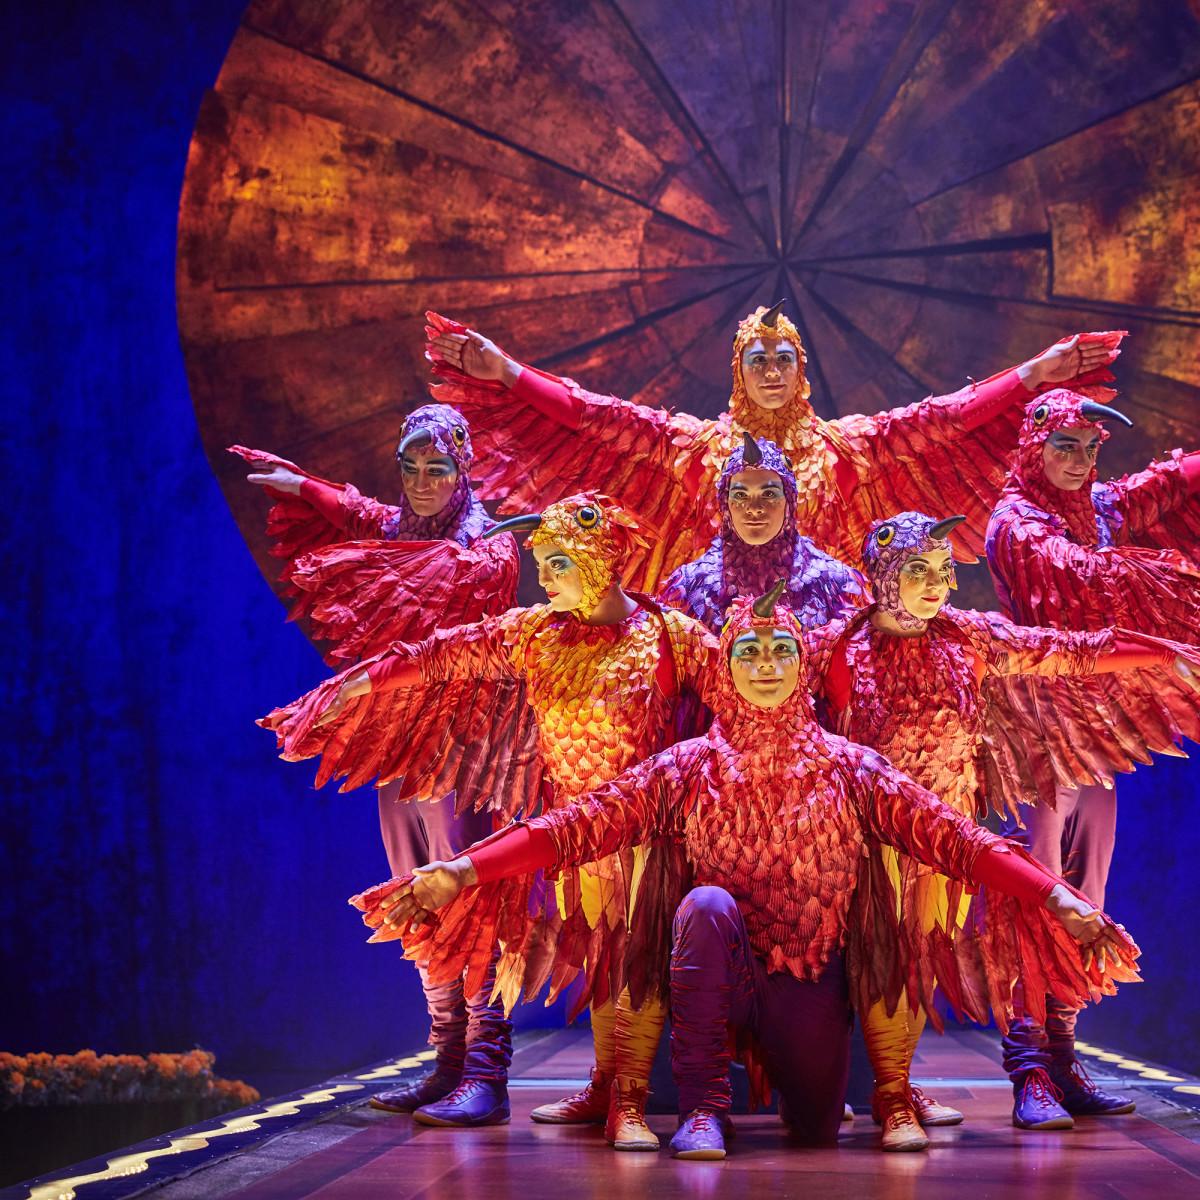 Cirque du Soleil: Luzia, Hoop Diving